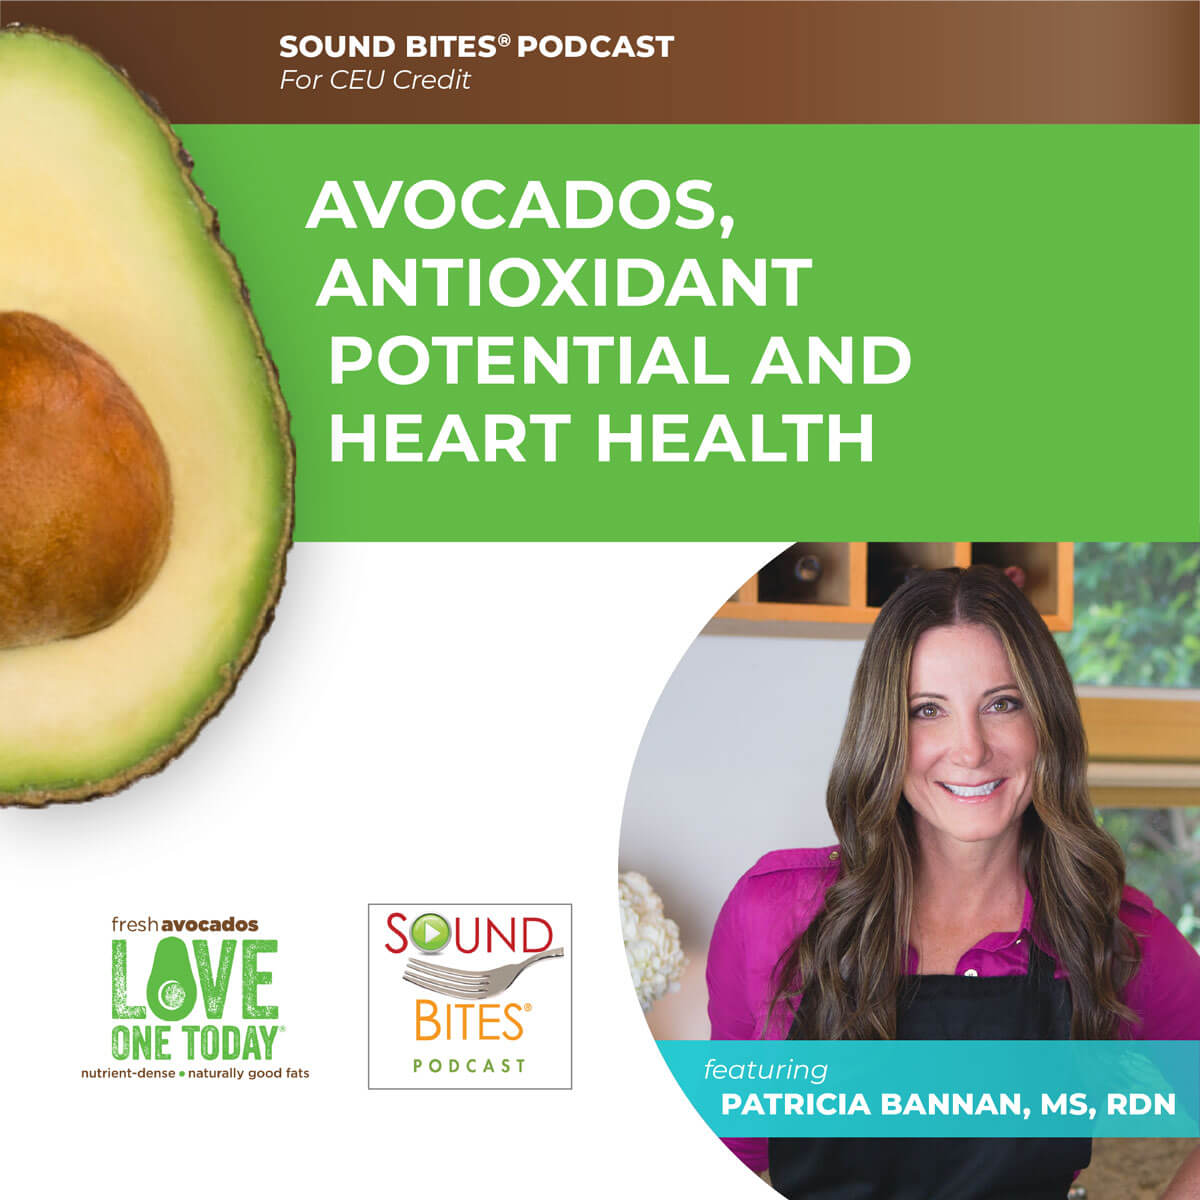 Avocados, Antioxidant Potential and Heart Health – Patricia Bannan, MS, RDN